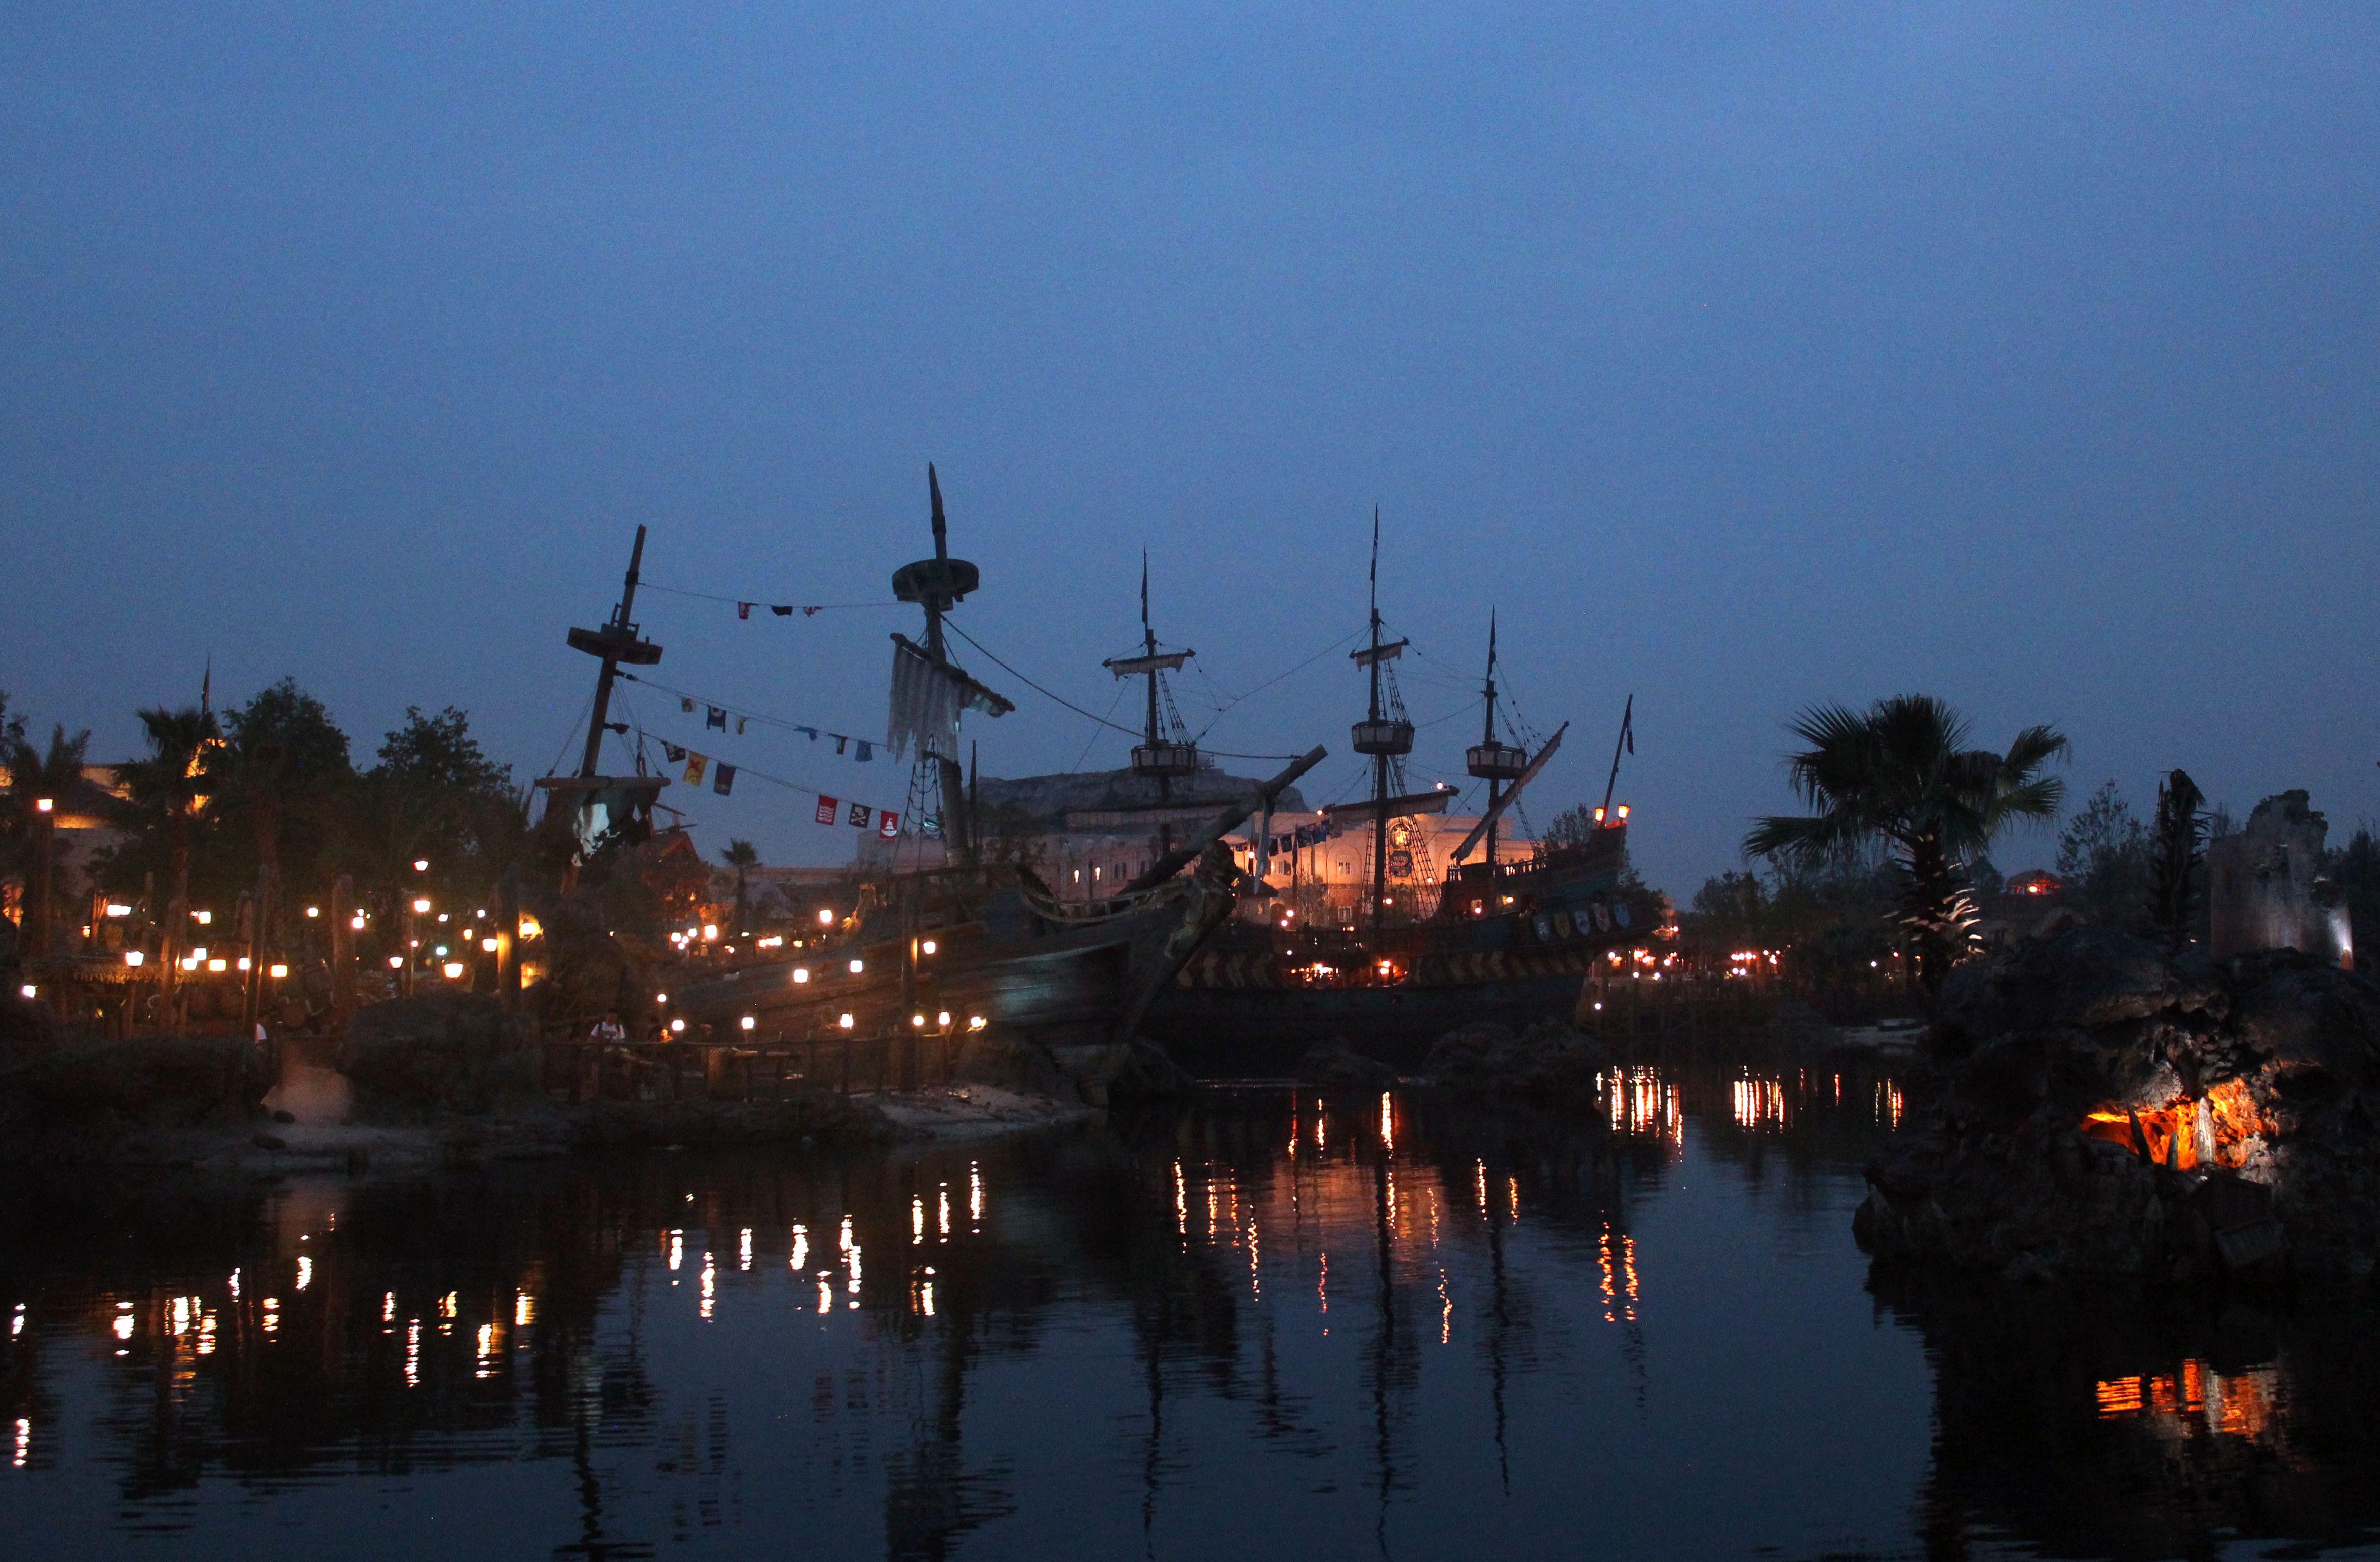 Shanghai Disneyland Treasure Cove